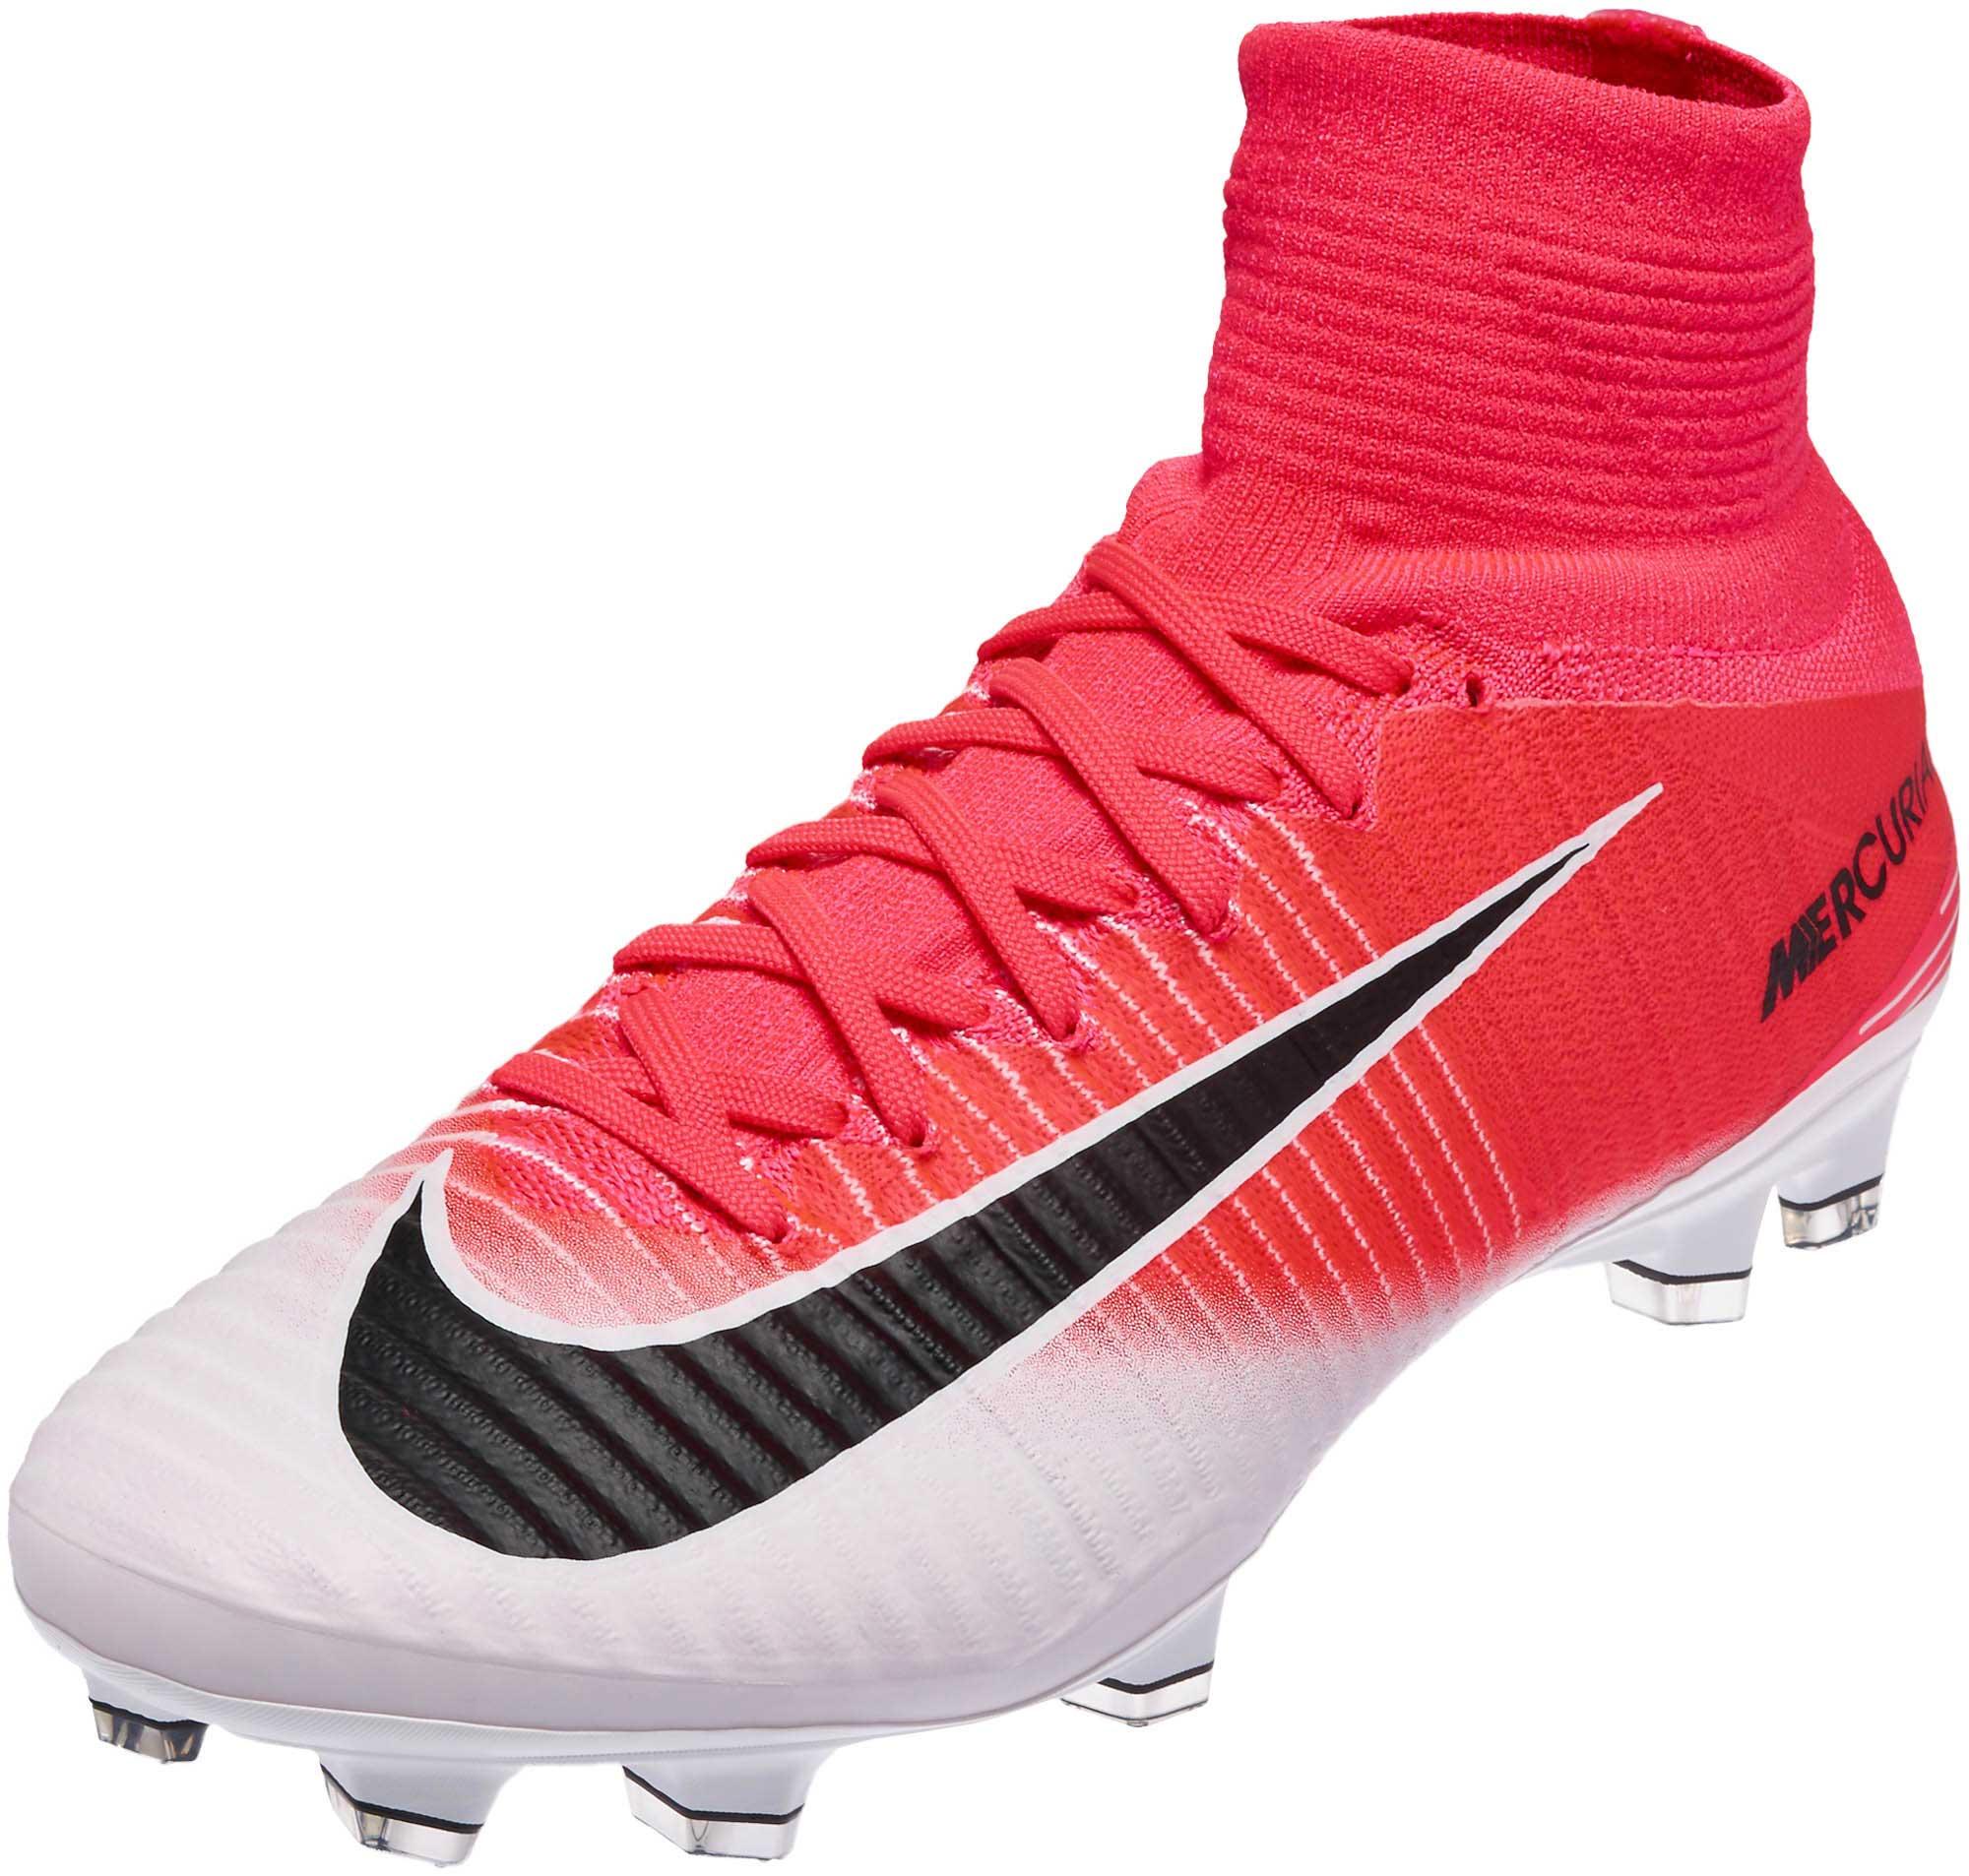 sale retailer a22ab 7f653 Nike Mercurial Superfly V FG – Racer Pink Black